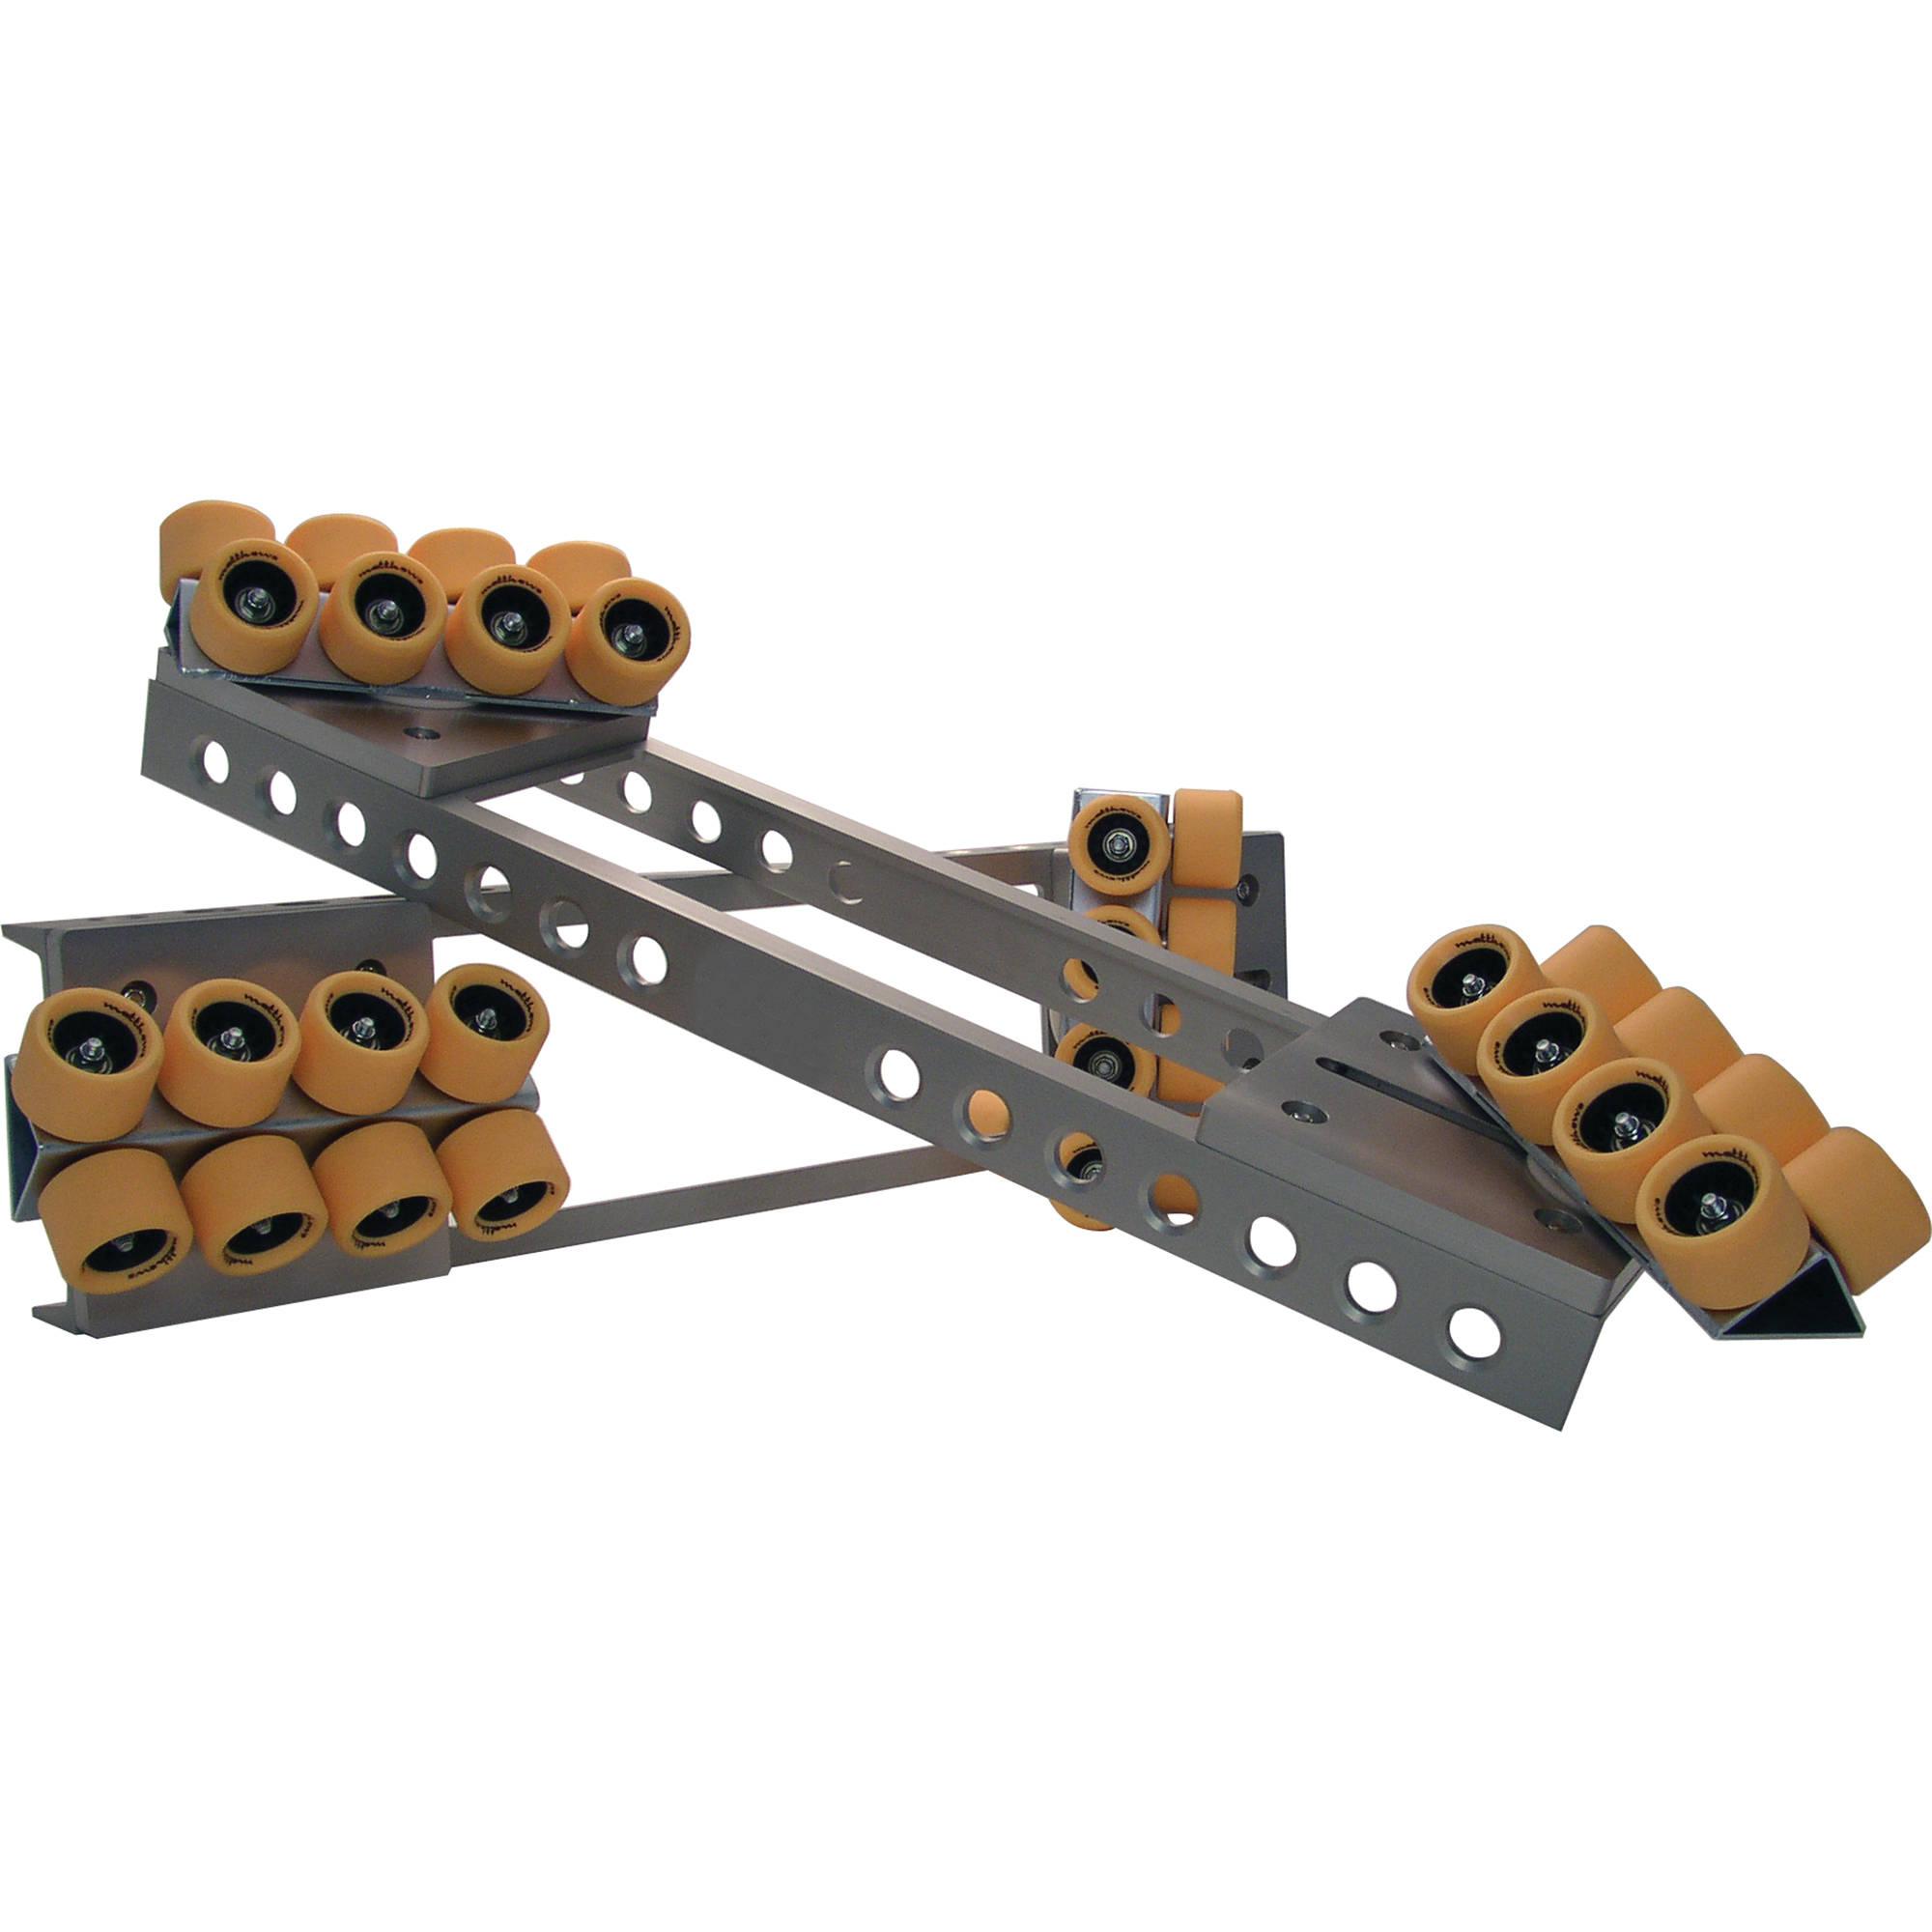 Men In Capes, Inc. |  Doorway Dolly Rental |  Grip Equipment Rental |